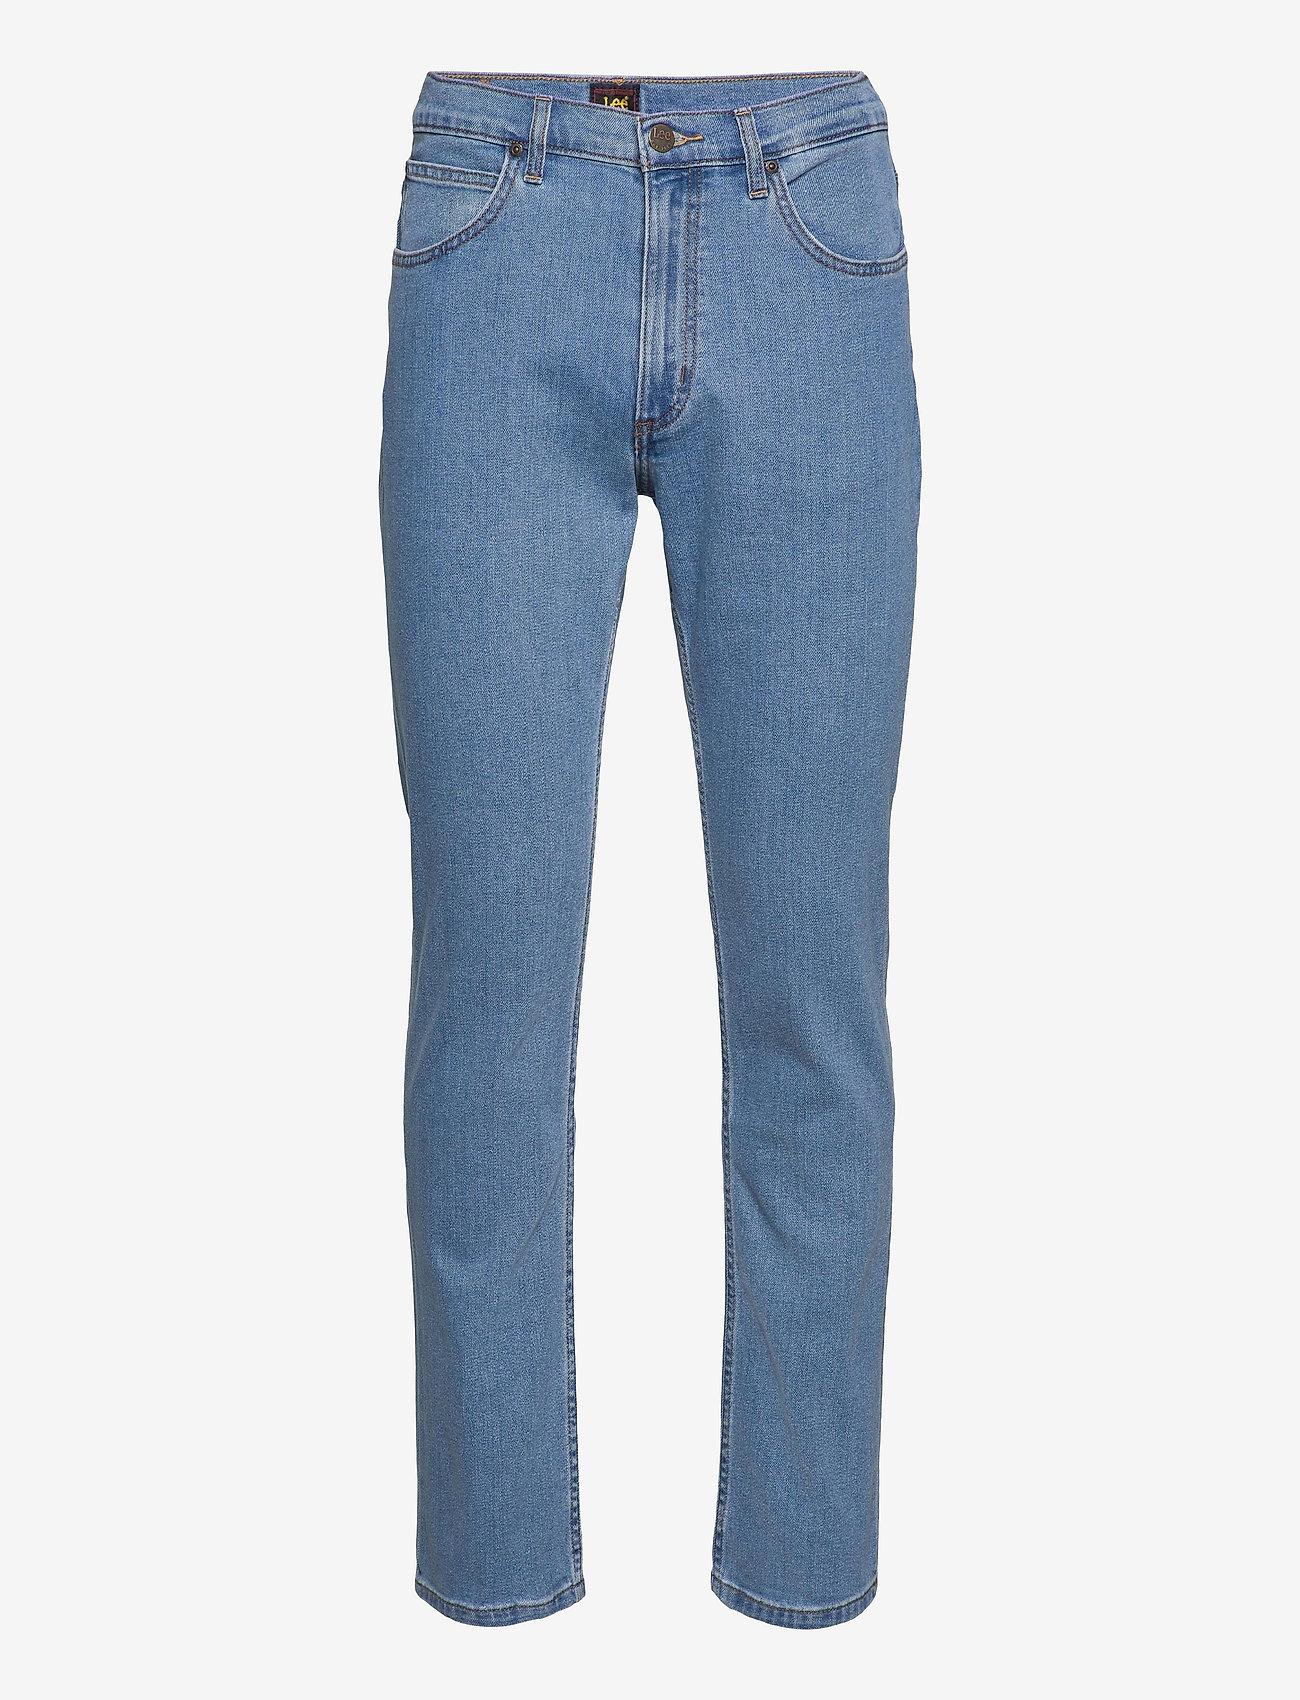 Lee Jeans - BROOKLYN STRAIGHT - regular jeans - light stone - 0